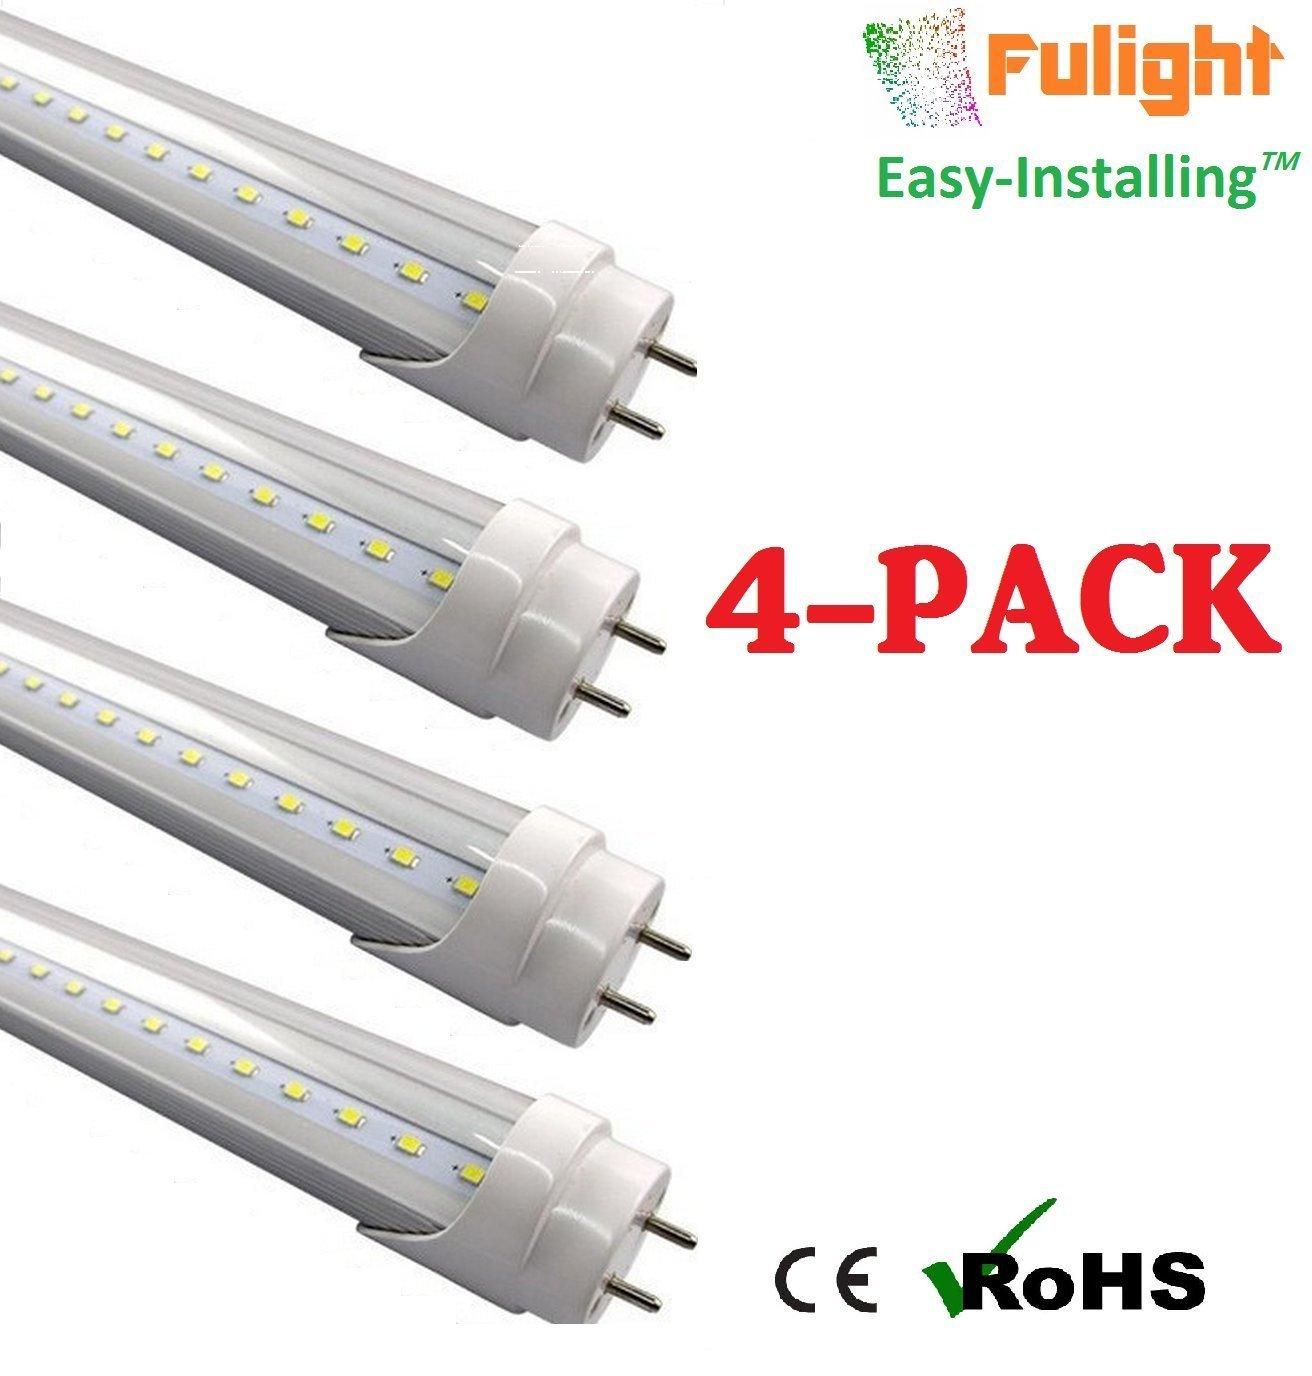 Fulight Easy Installing Clear T8 Led Tube Light 2ft 24 10w Wiring Pendaflour Lamp 18w Equivalent Cool White 4000k F17t8 F18t8 F20t10 F20t12 Cw Double End Powered